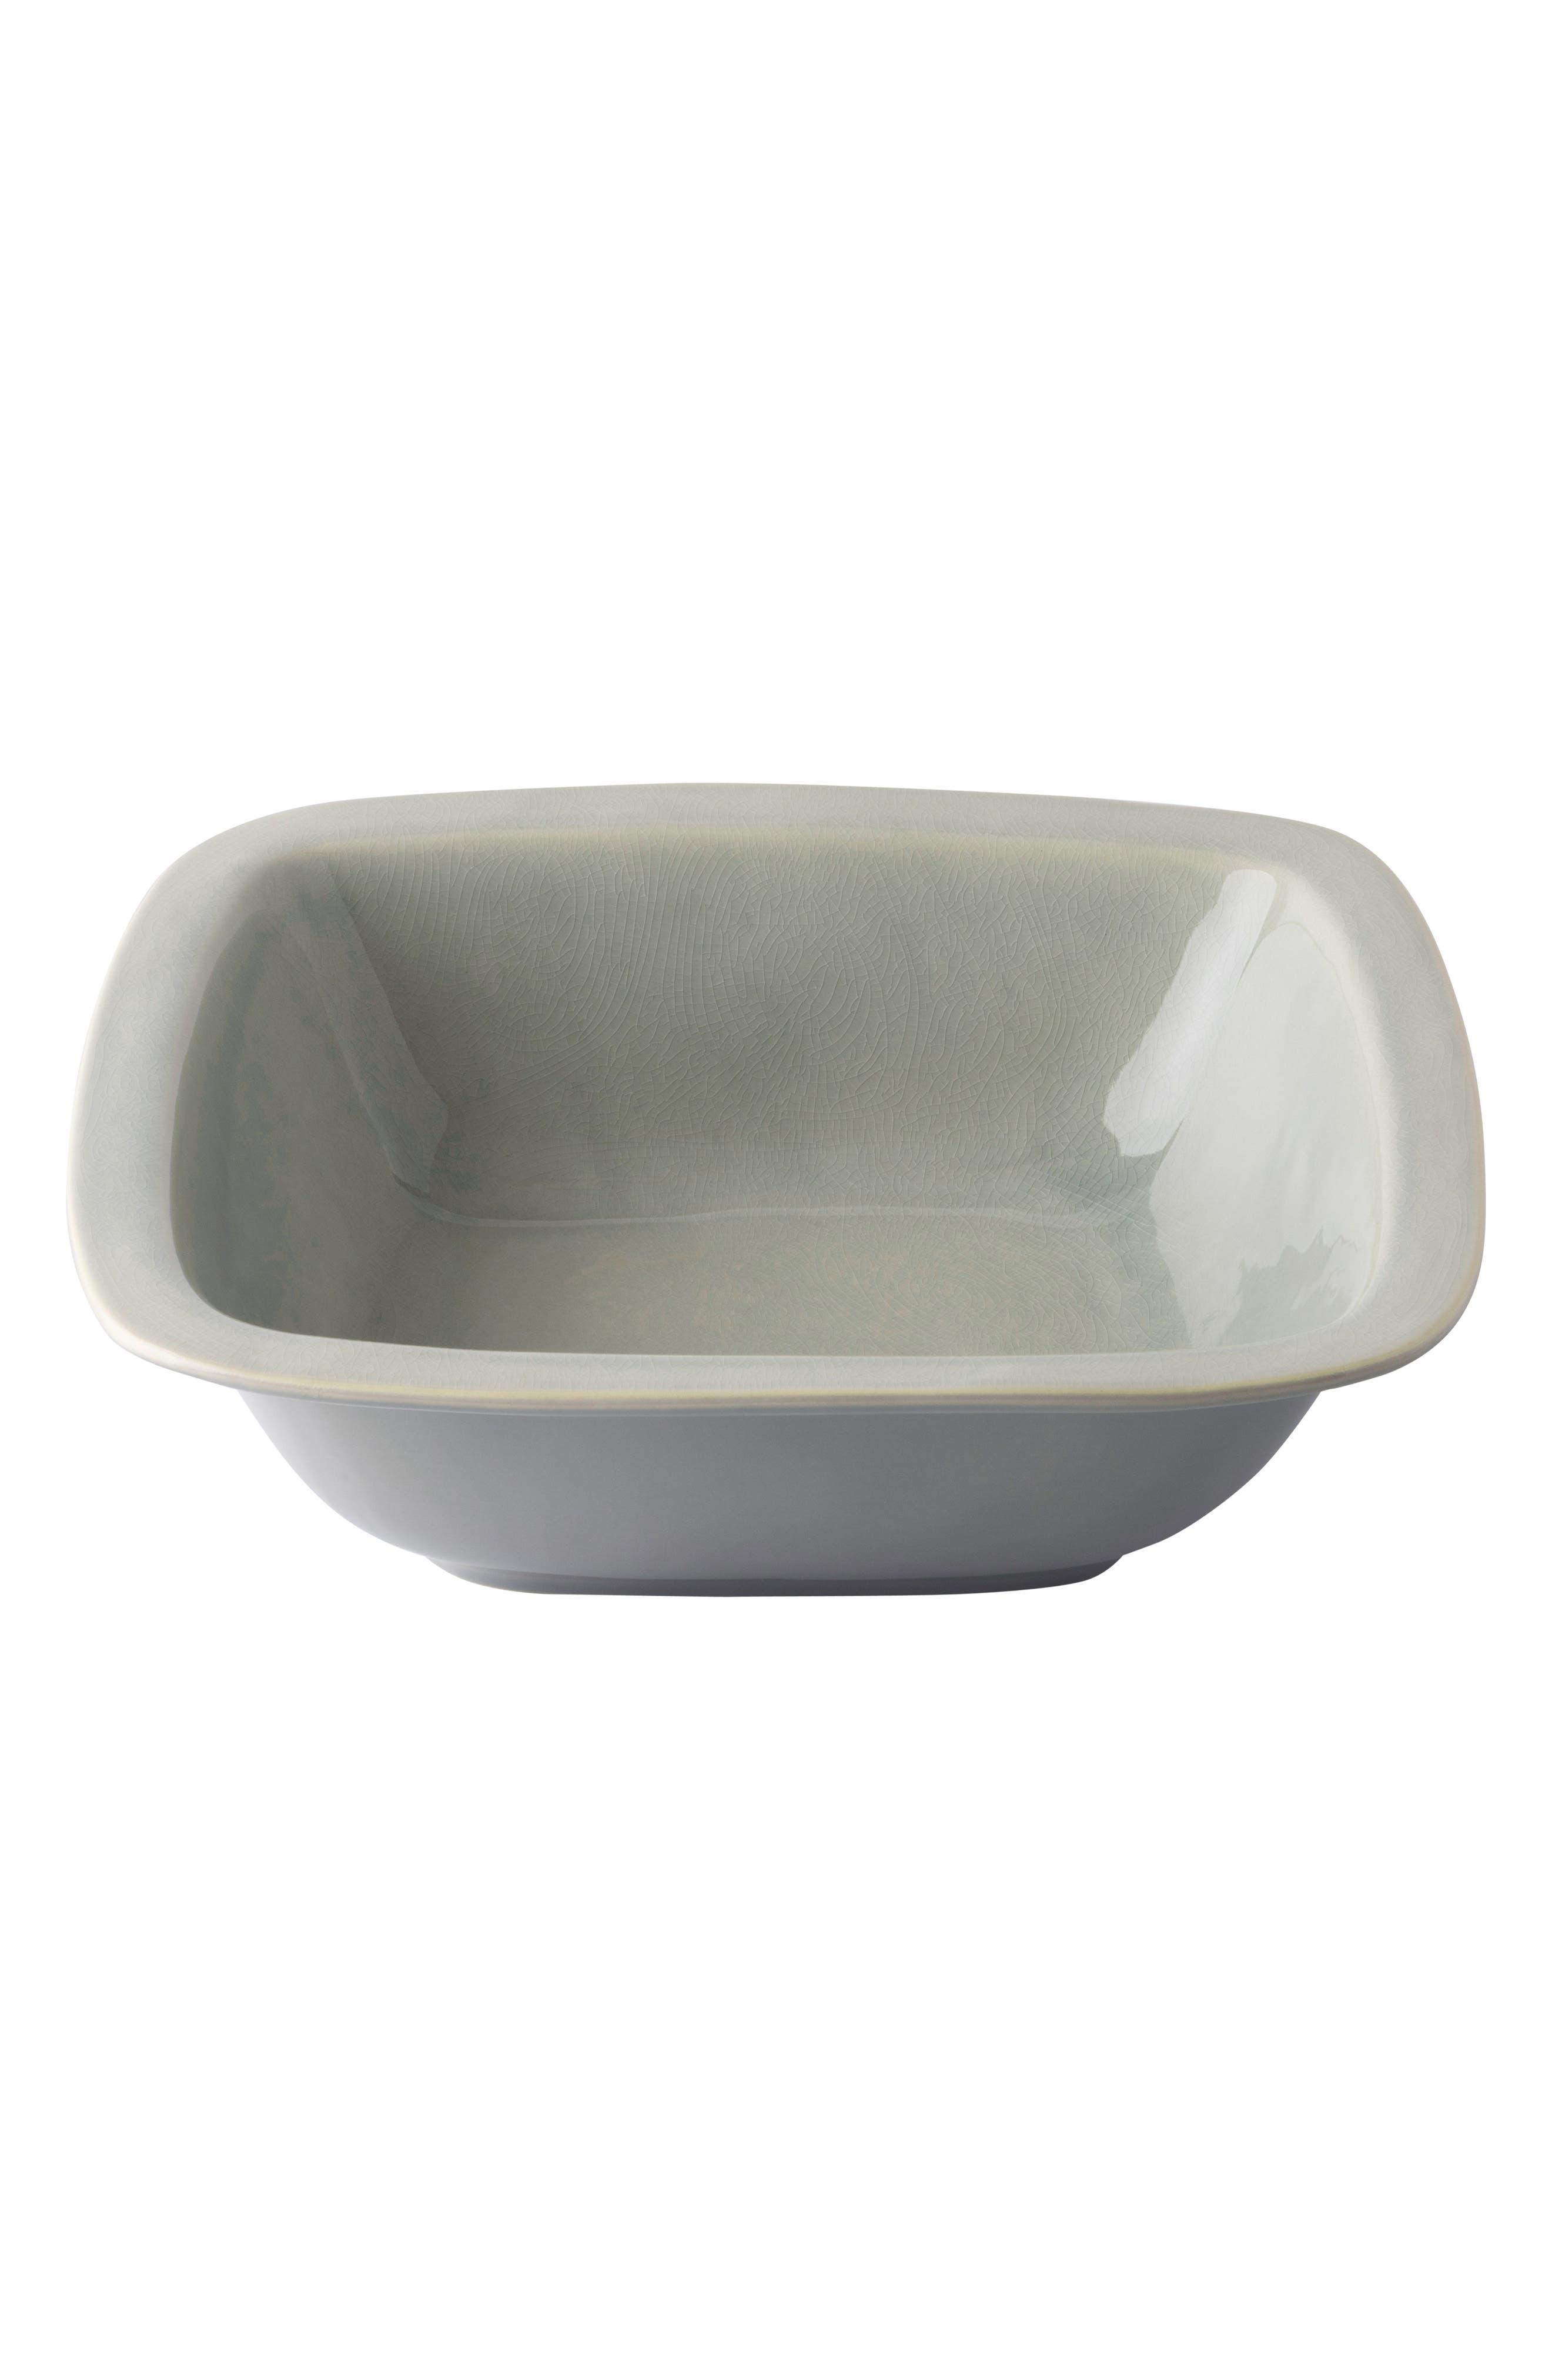 Plastic Sink Basin Bar 3 Dinnerware Dishes Plates Bowls Nordstrom